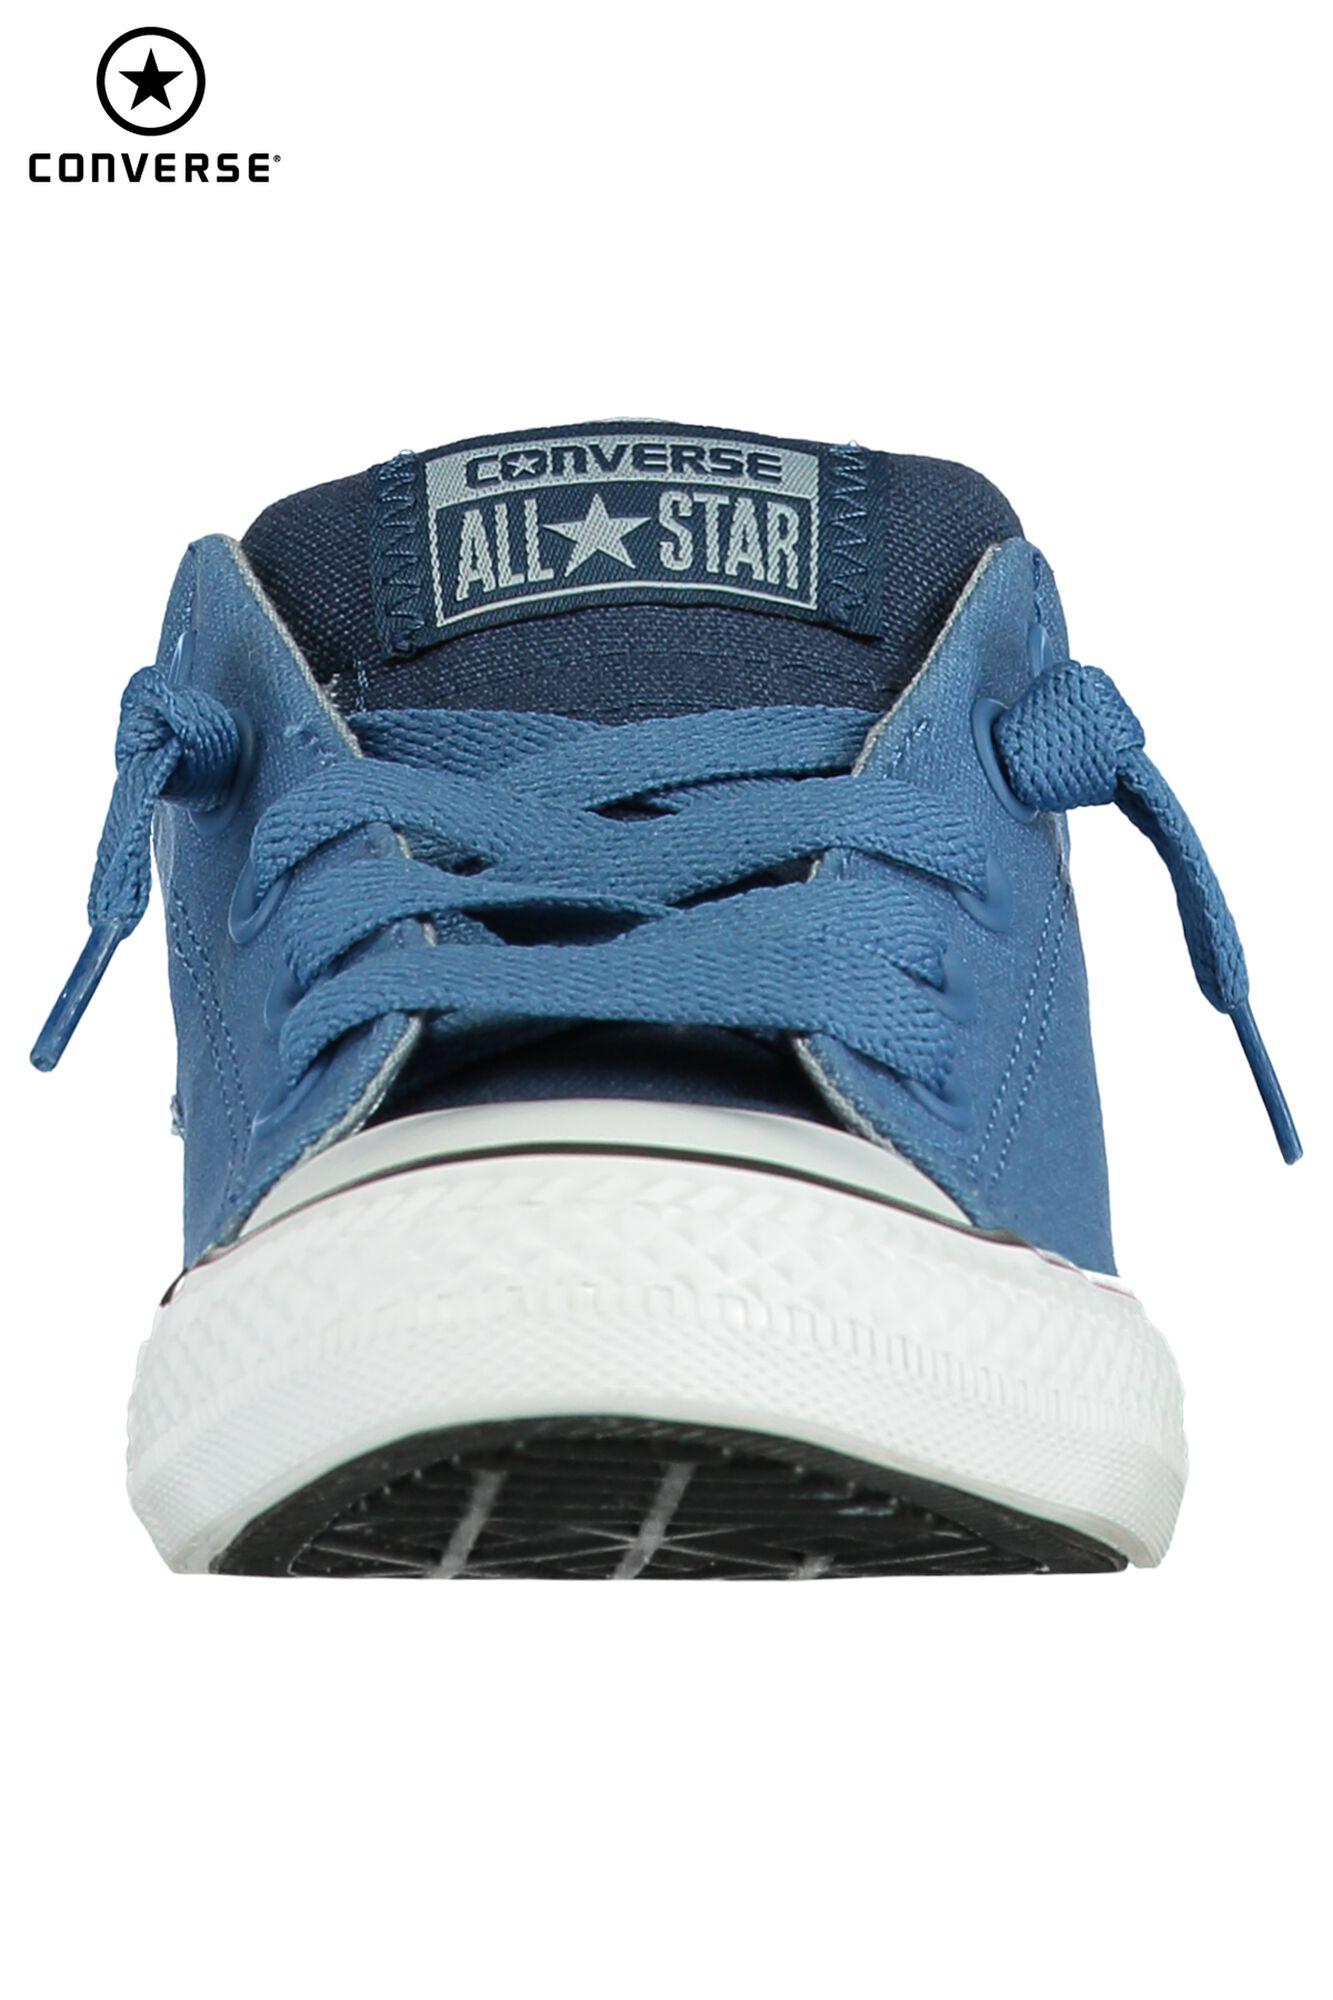 ed23cc6ae31 Jongens Converse All Stars street Blauw Kopen Online